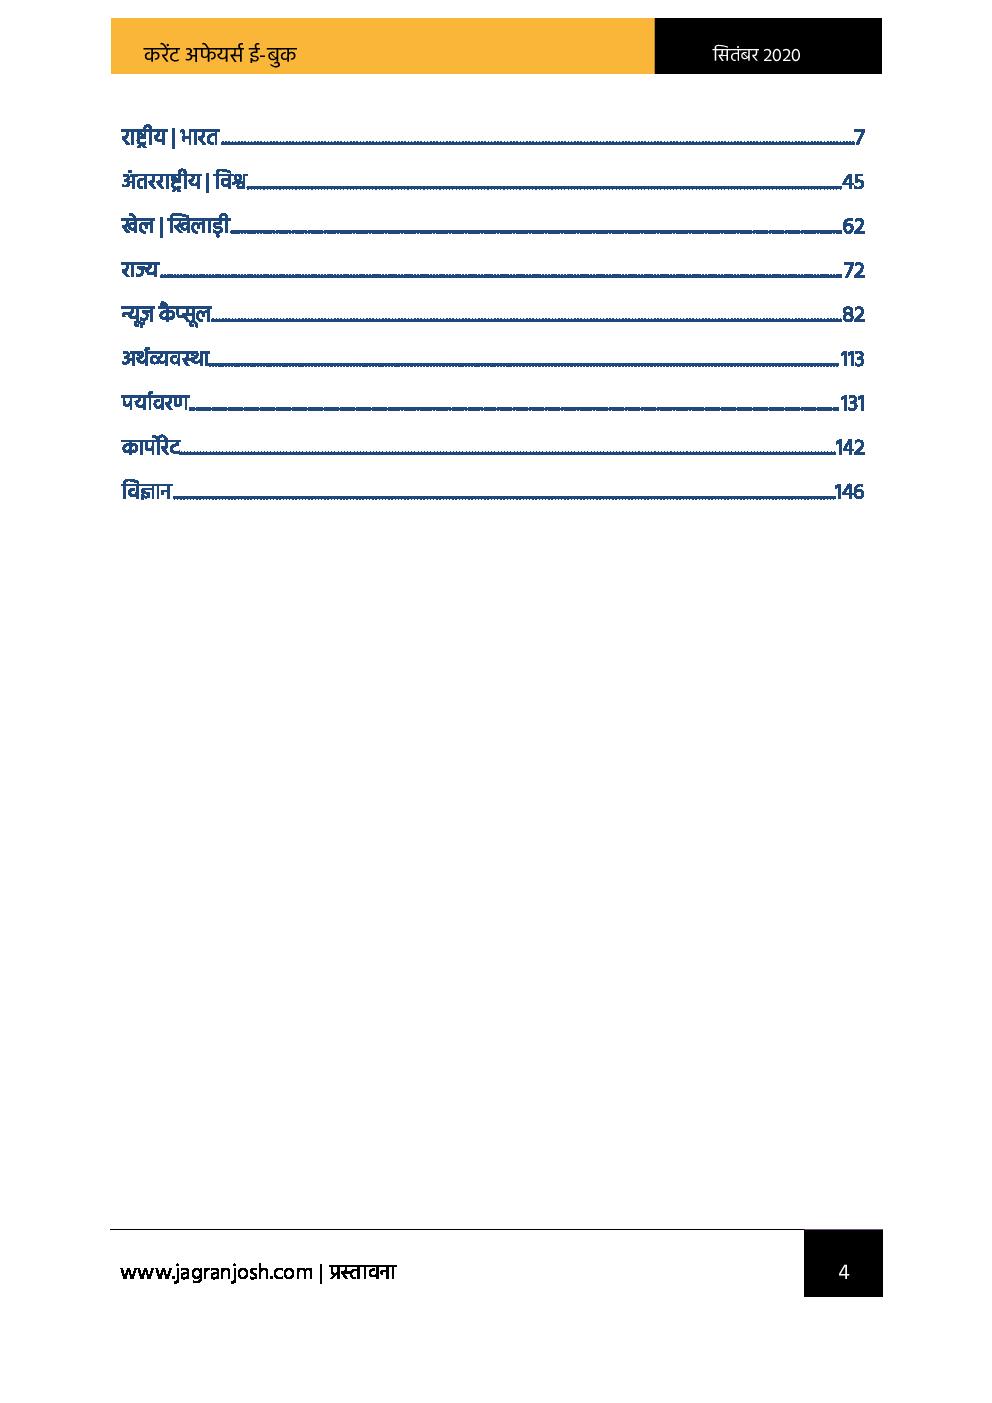 करेंट अफेयर्स सितम्बर 2020 ई-बुक - Page 4